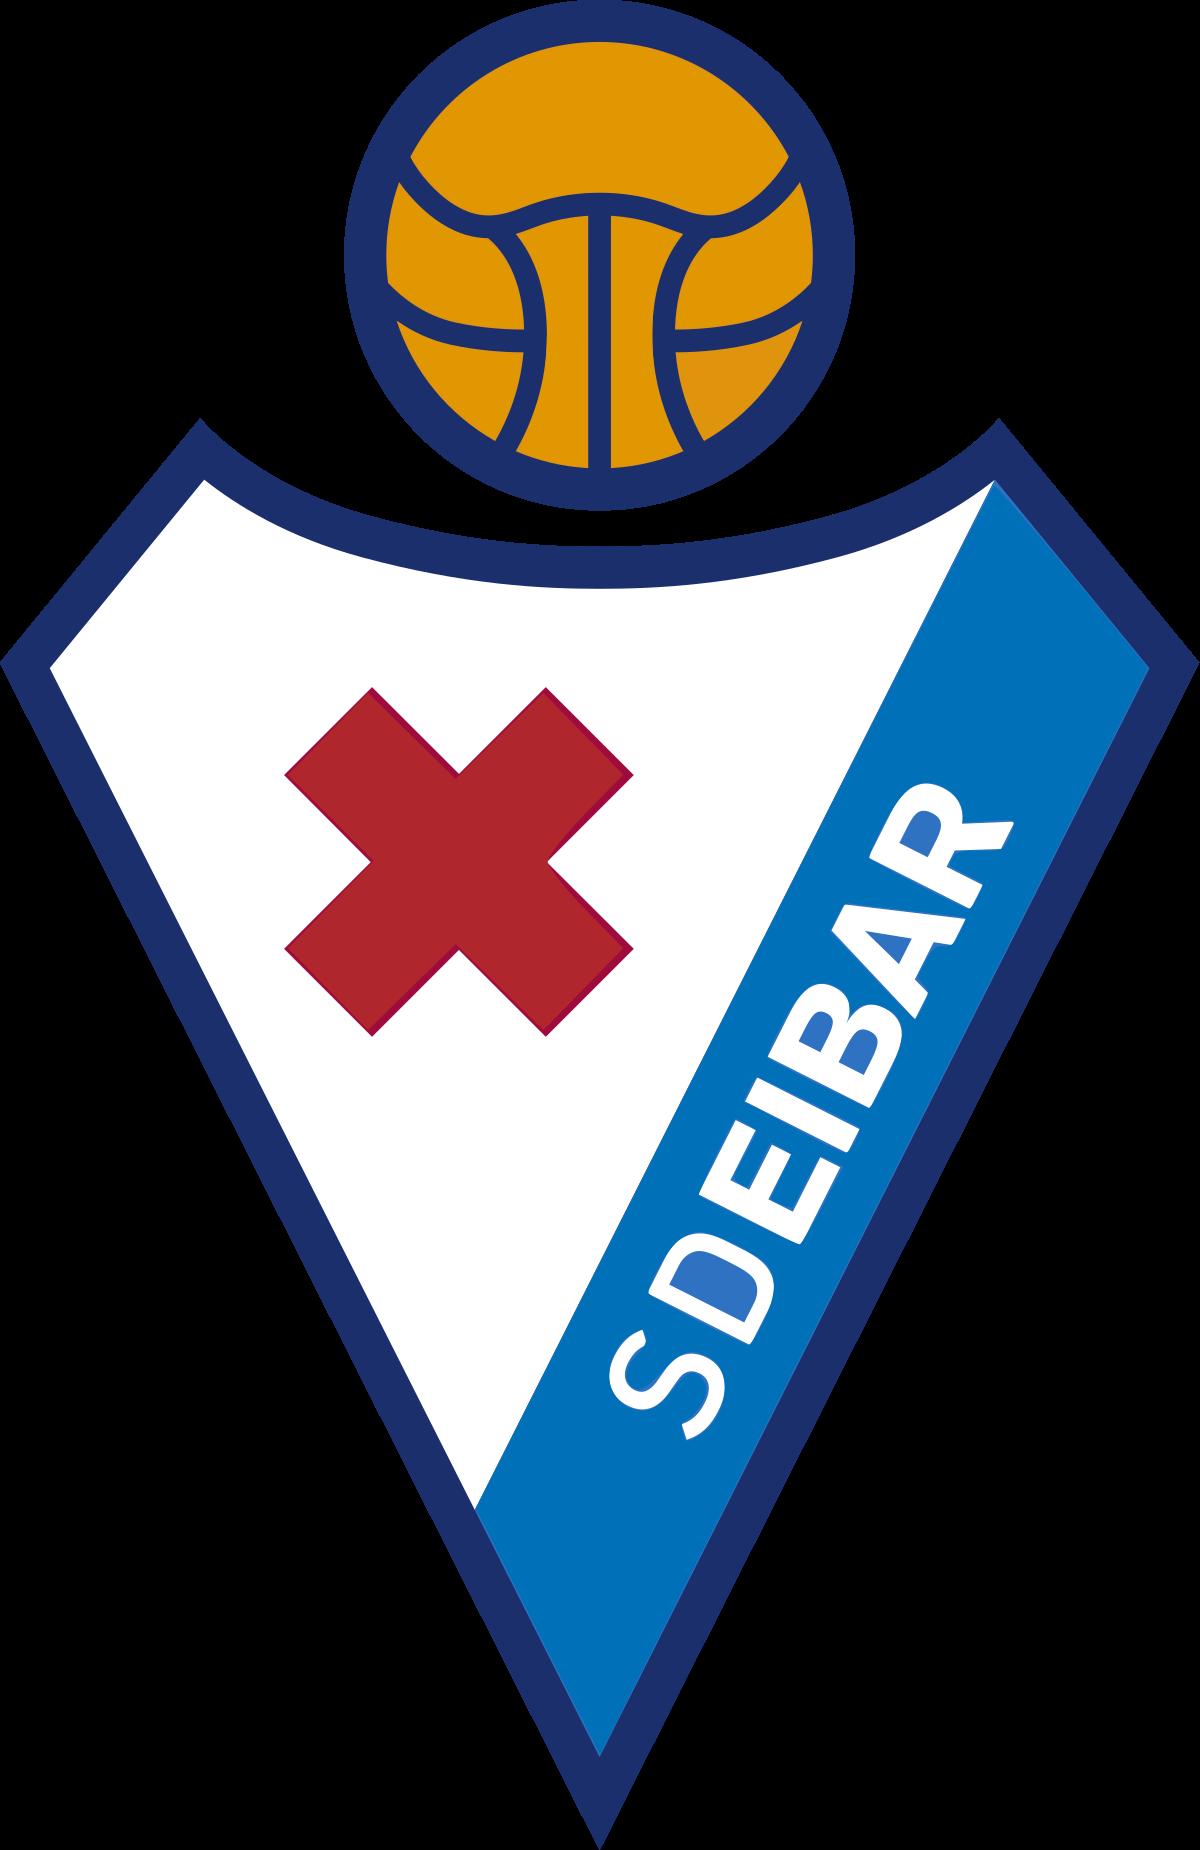 SD_Eibar_logo_2016svgpng